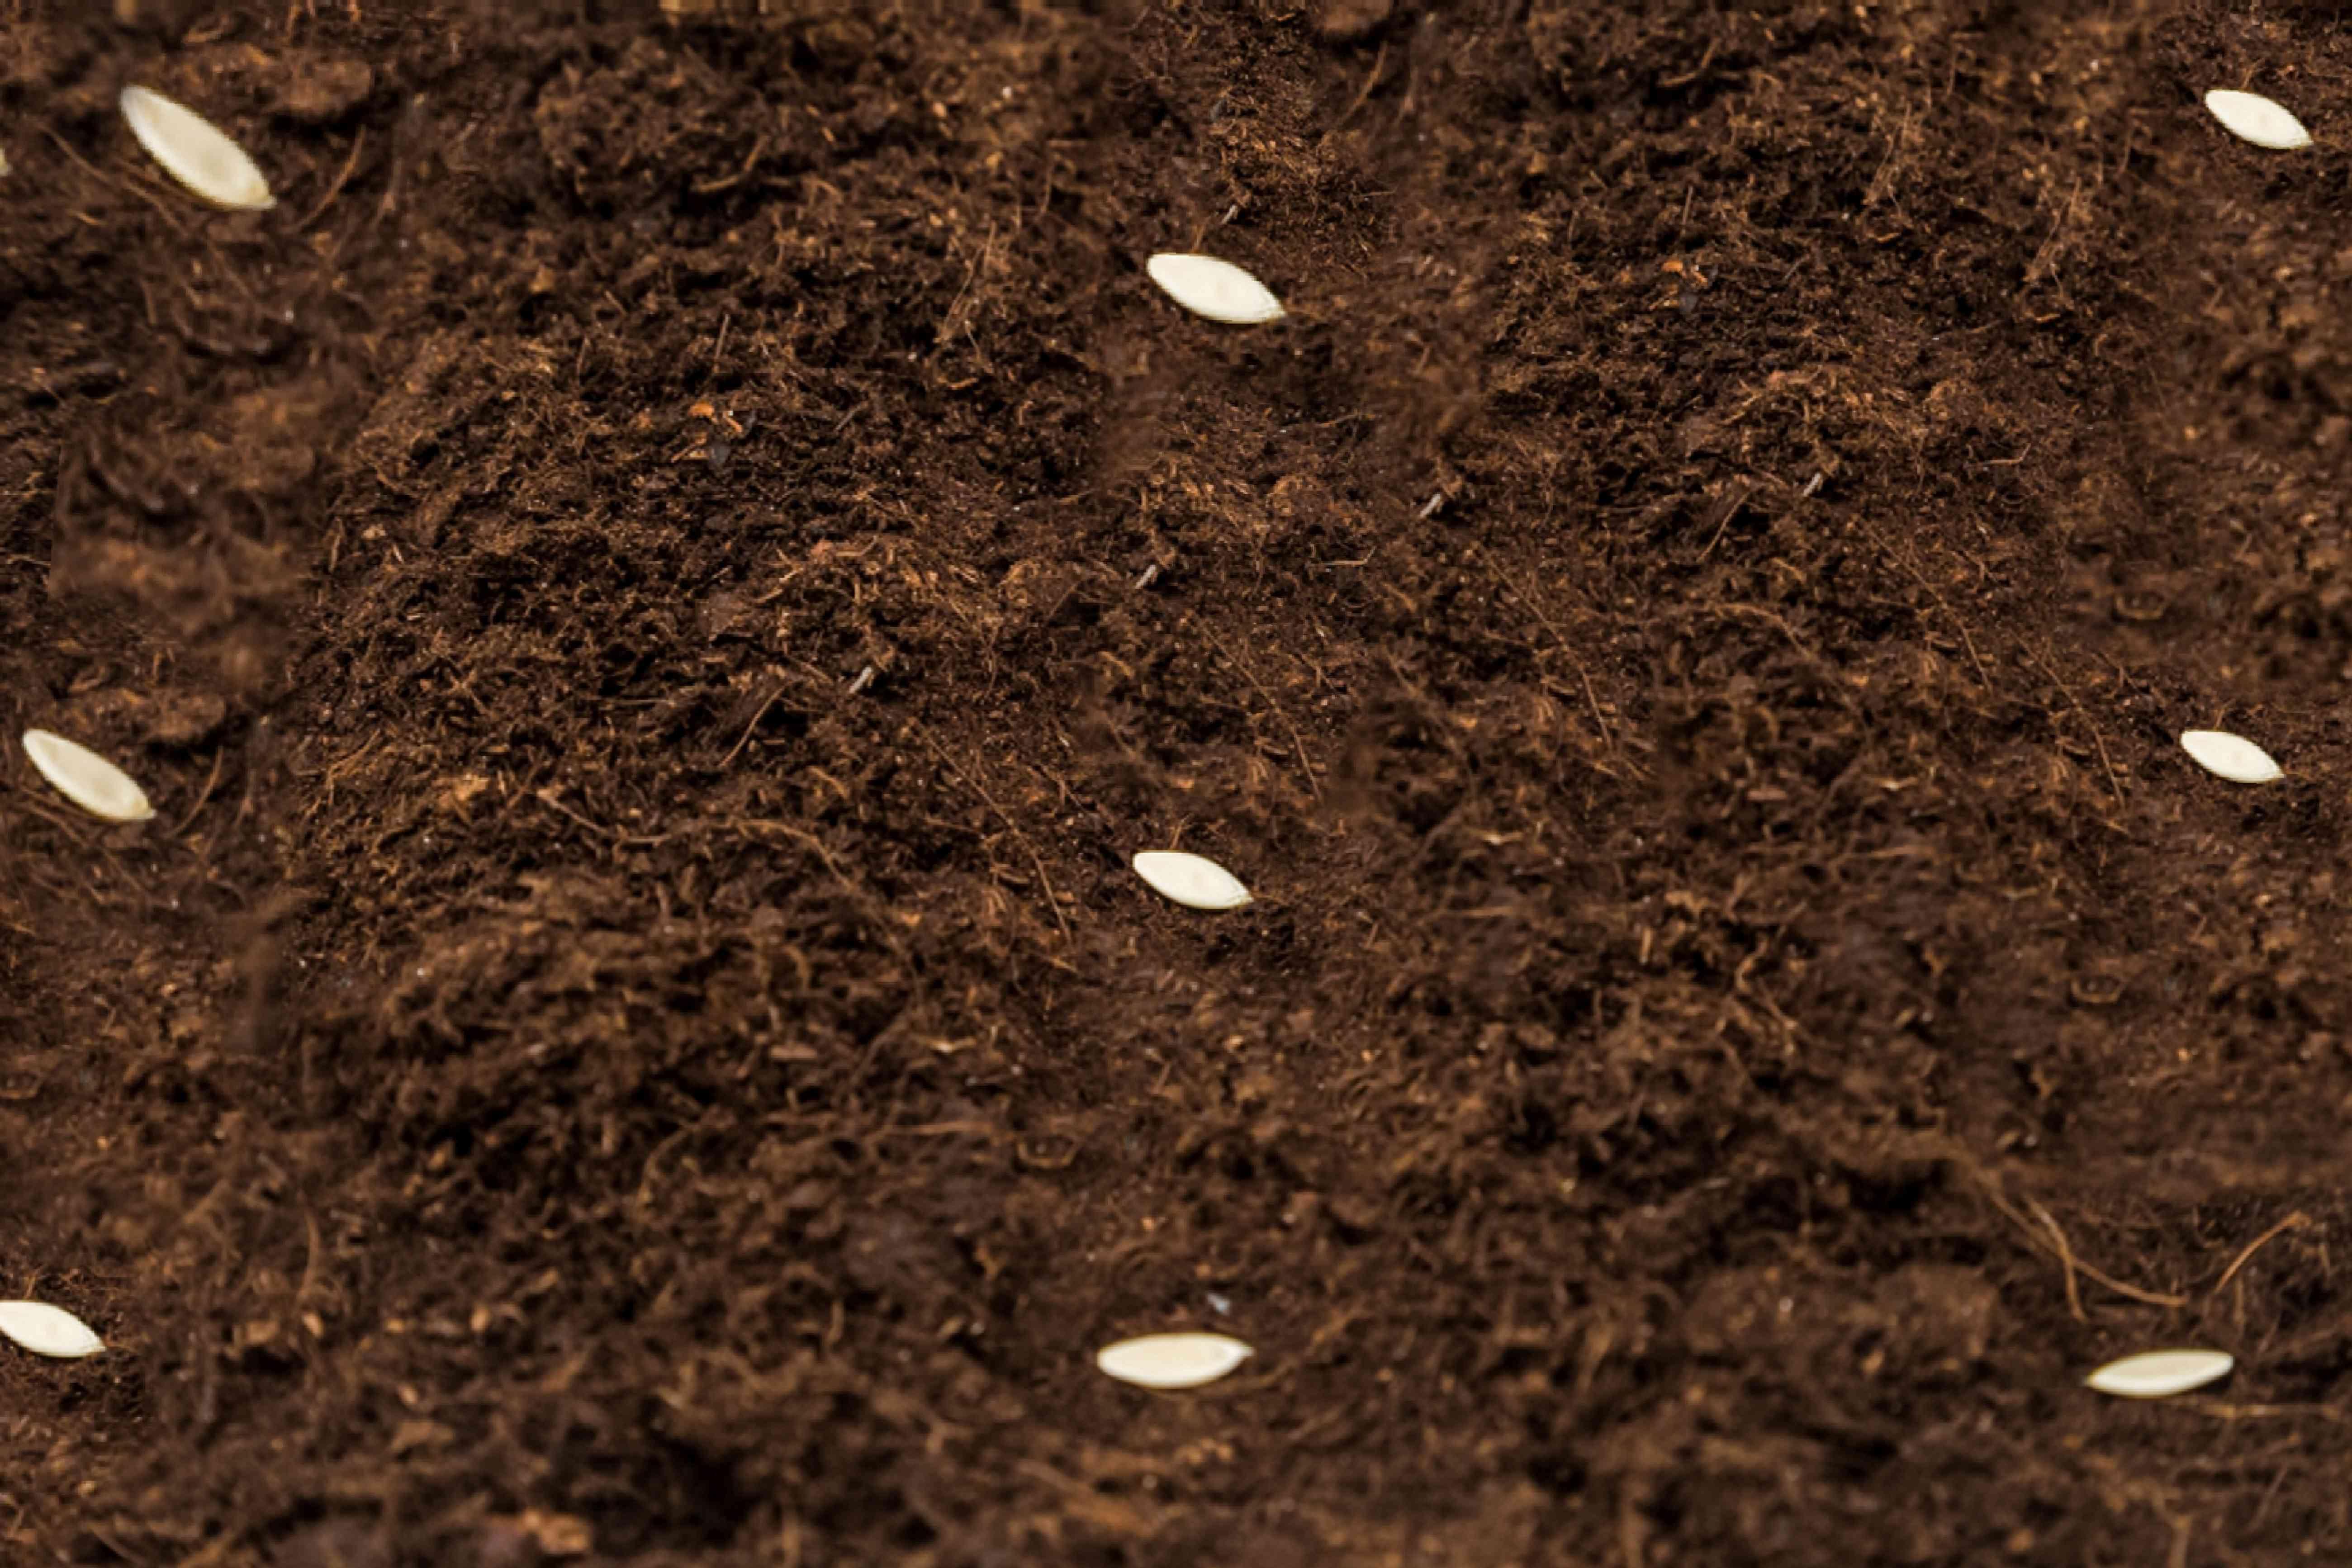 planting cucumber seeds